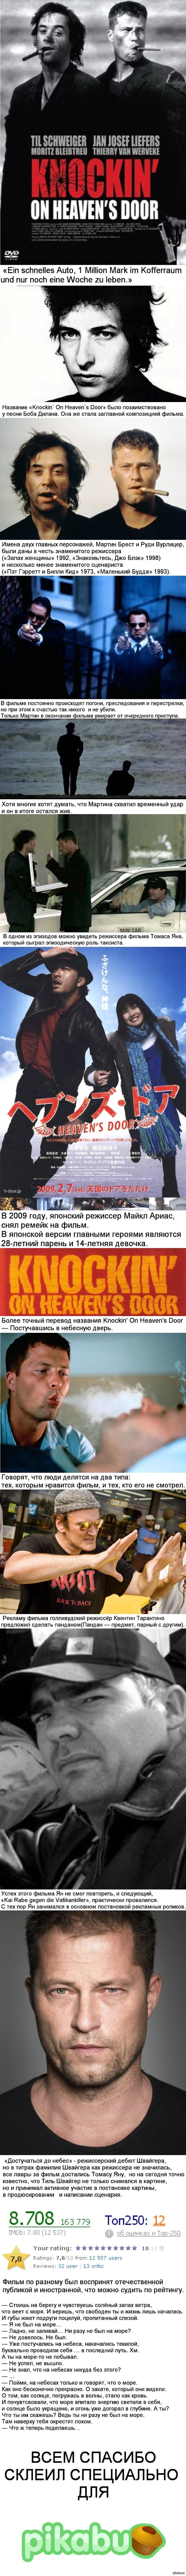 http://s.pikabu.ru/post_img/2013/03/19/9/1363701351_255621972.jpg